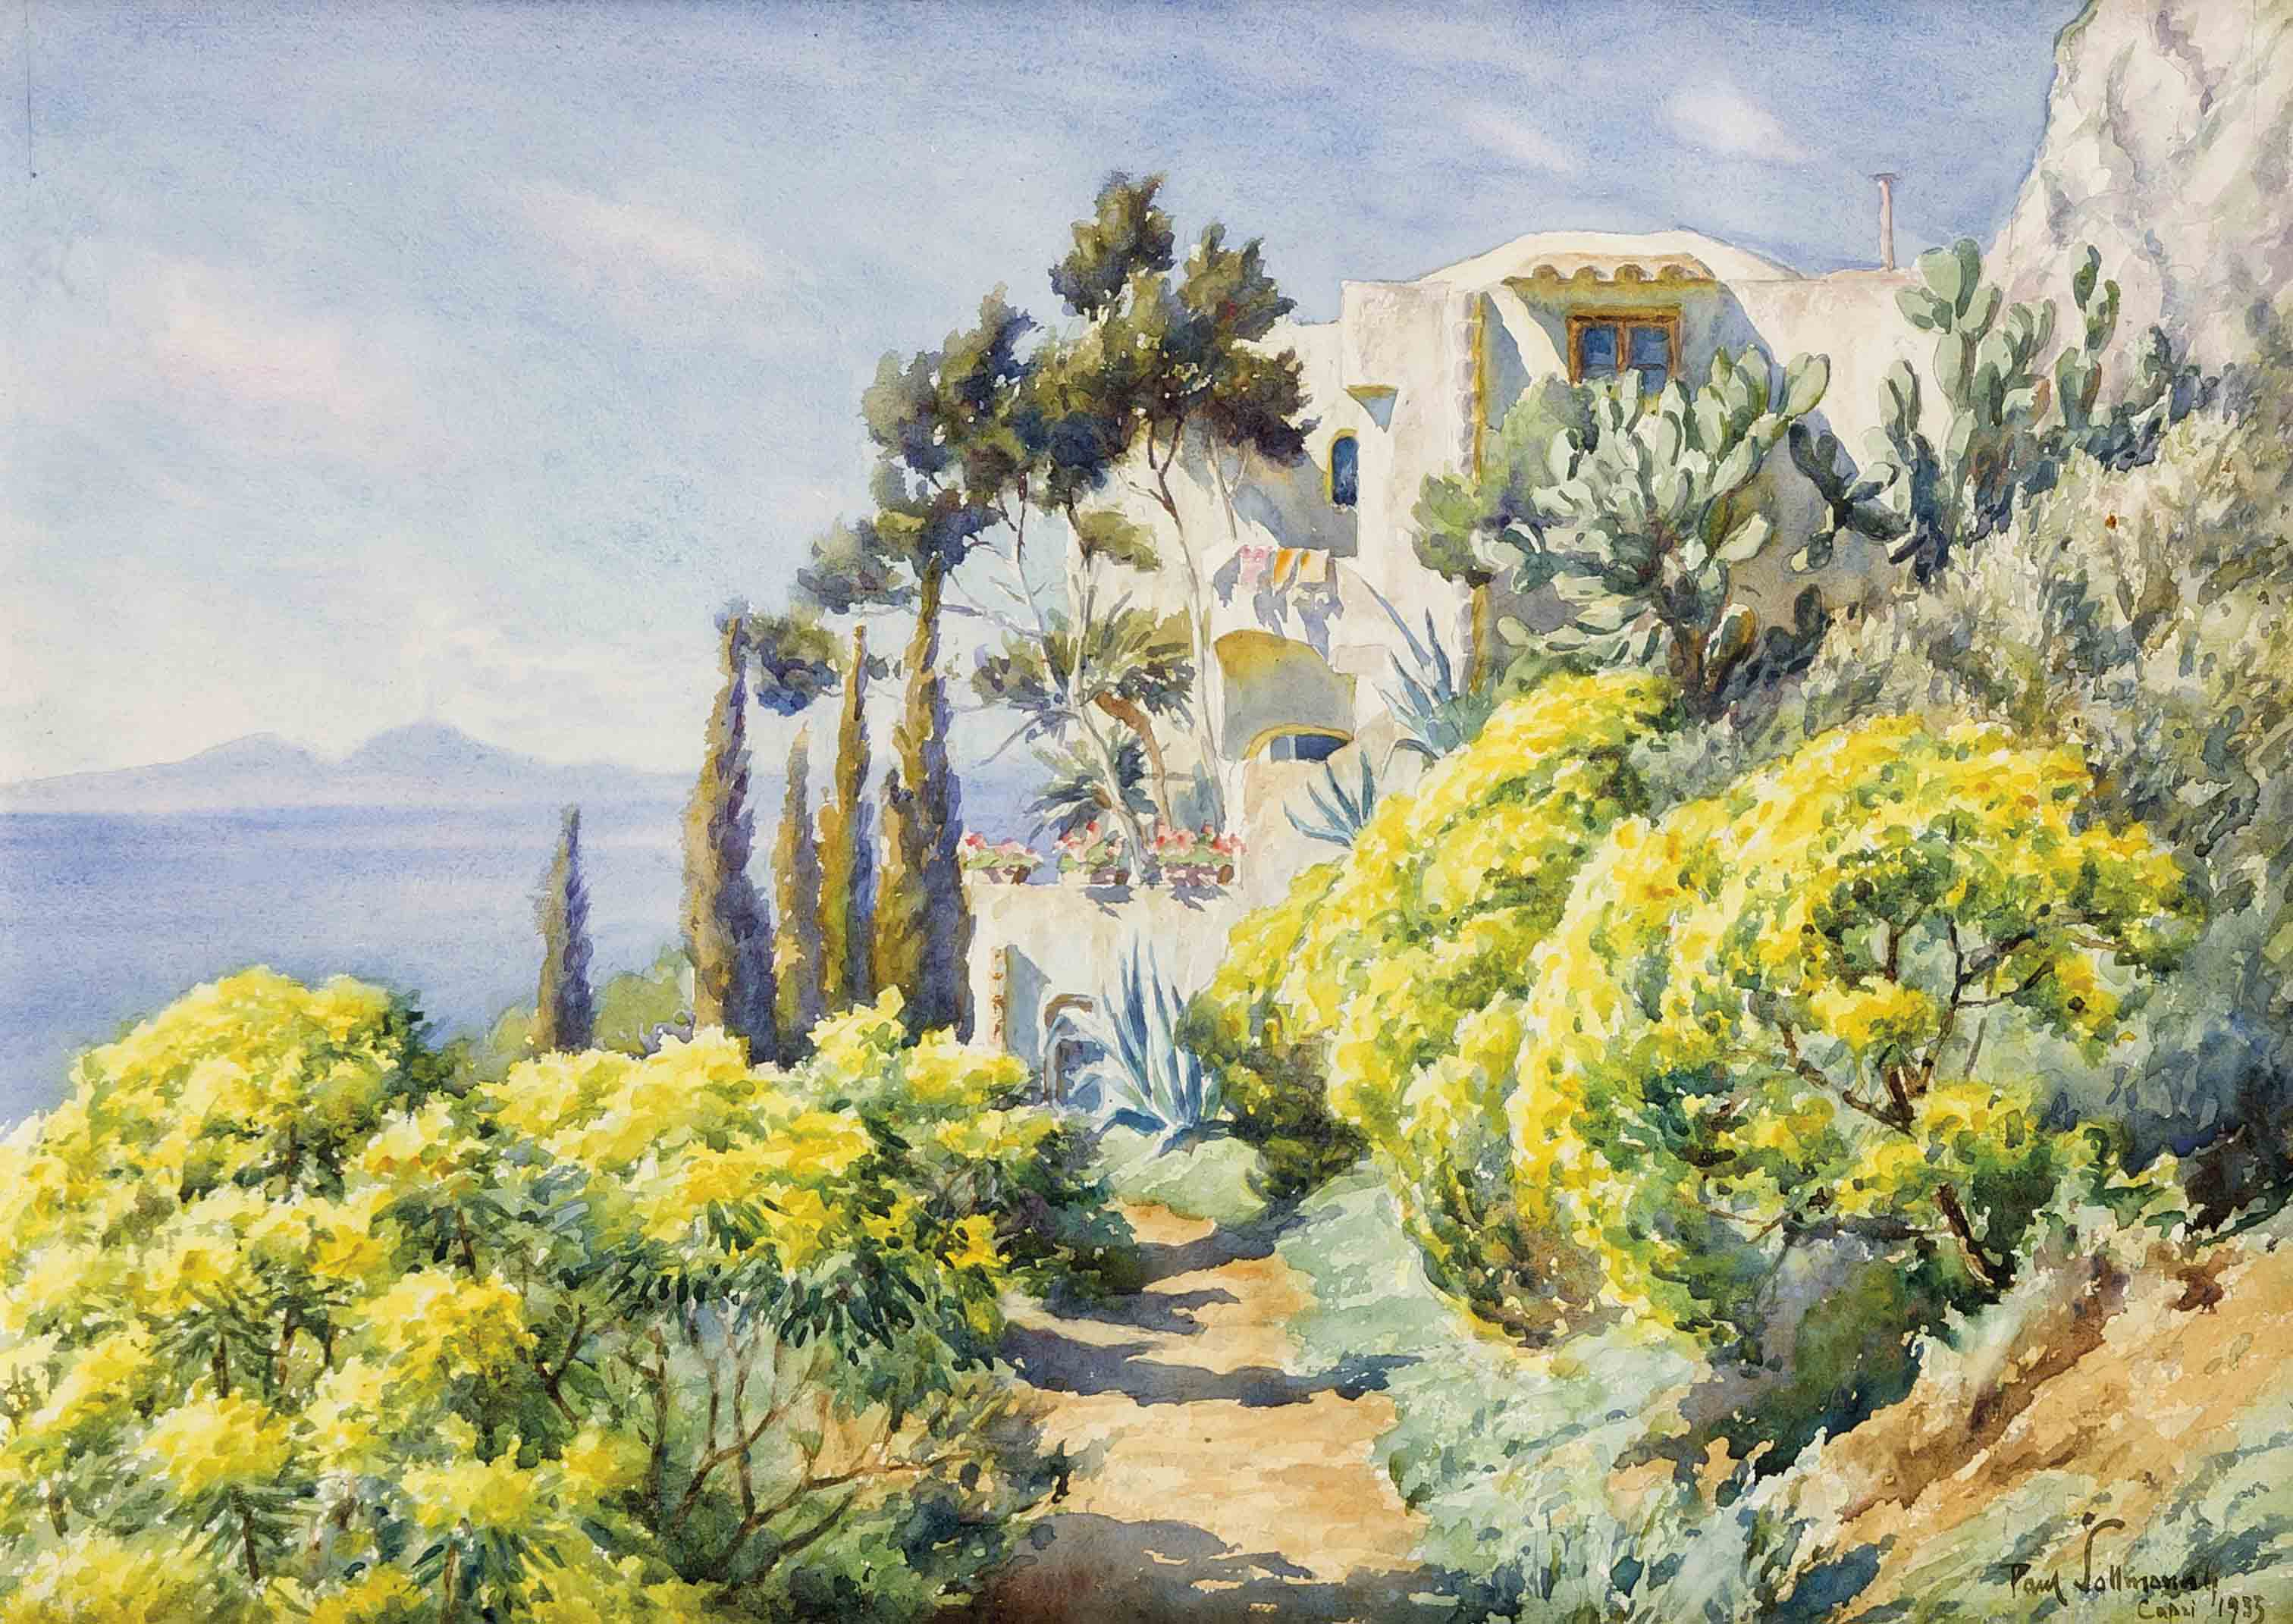 Paul Sollman (1886-1950), in Coburg geb